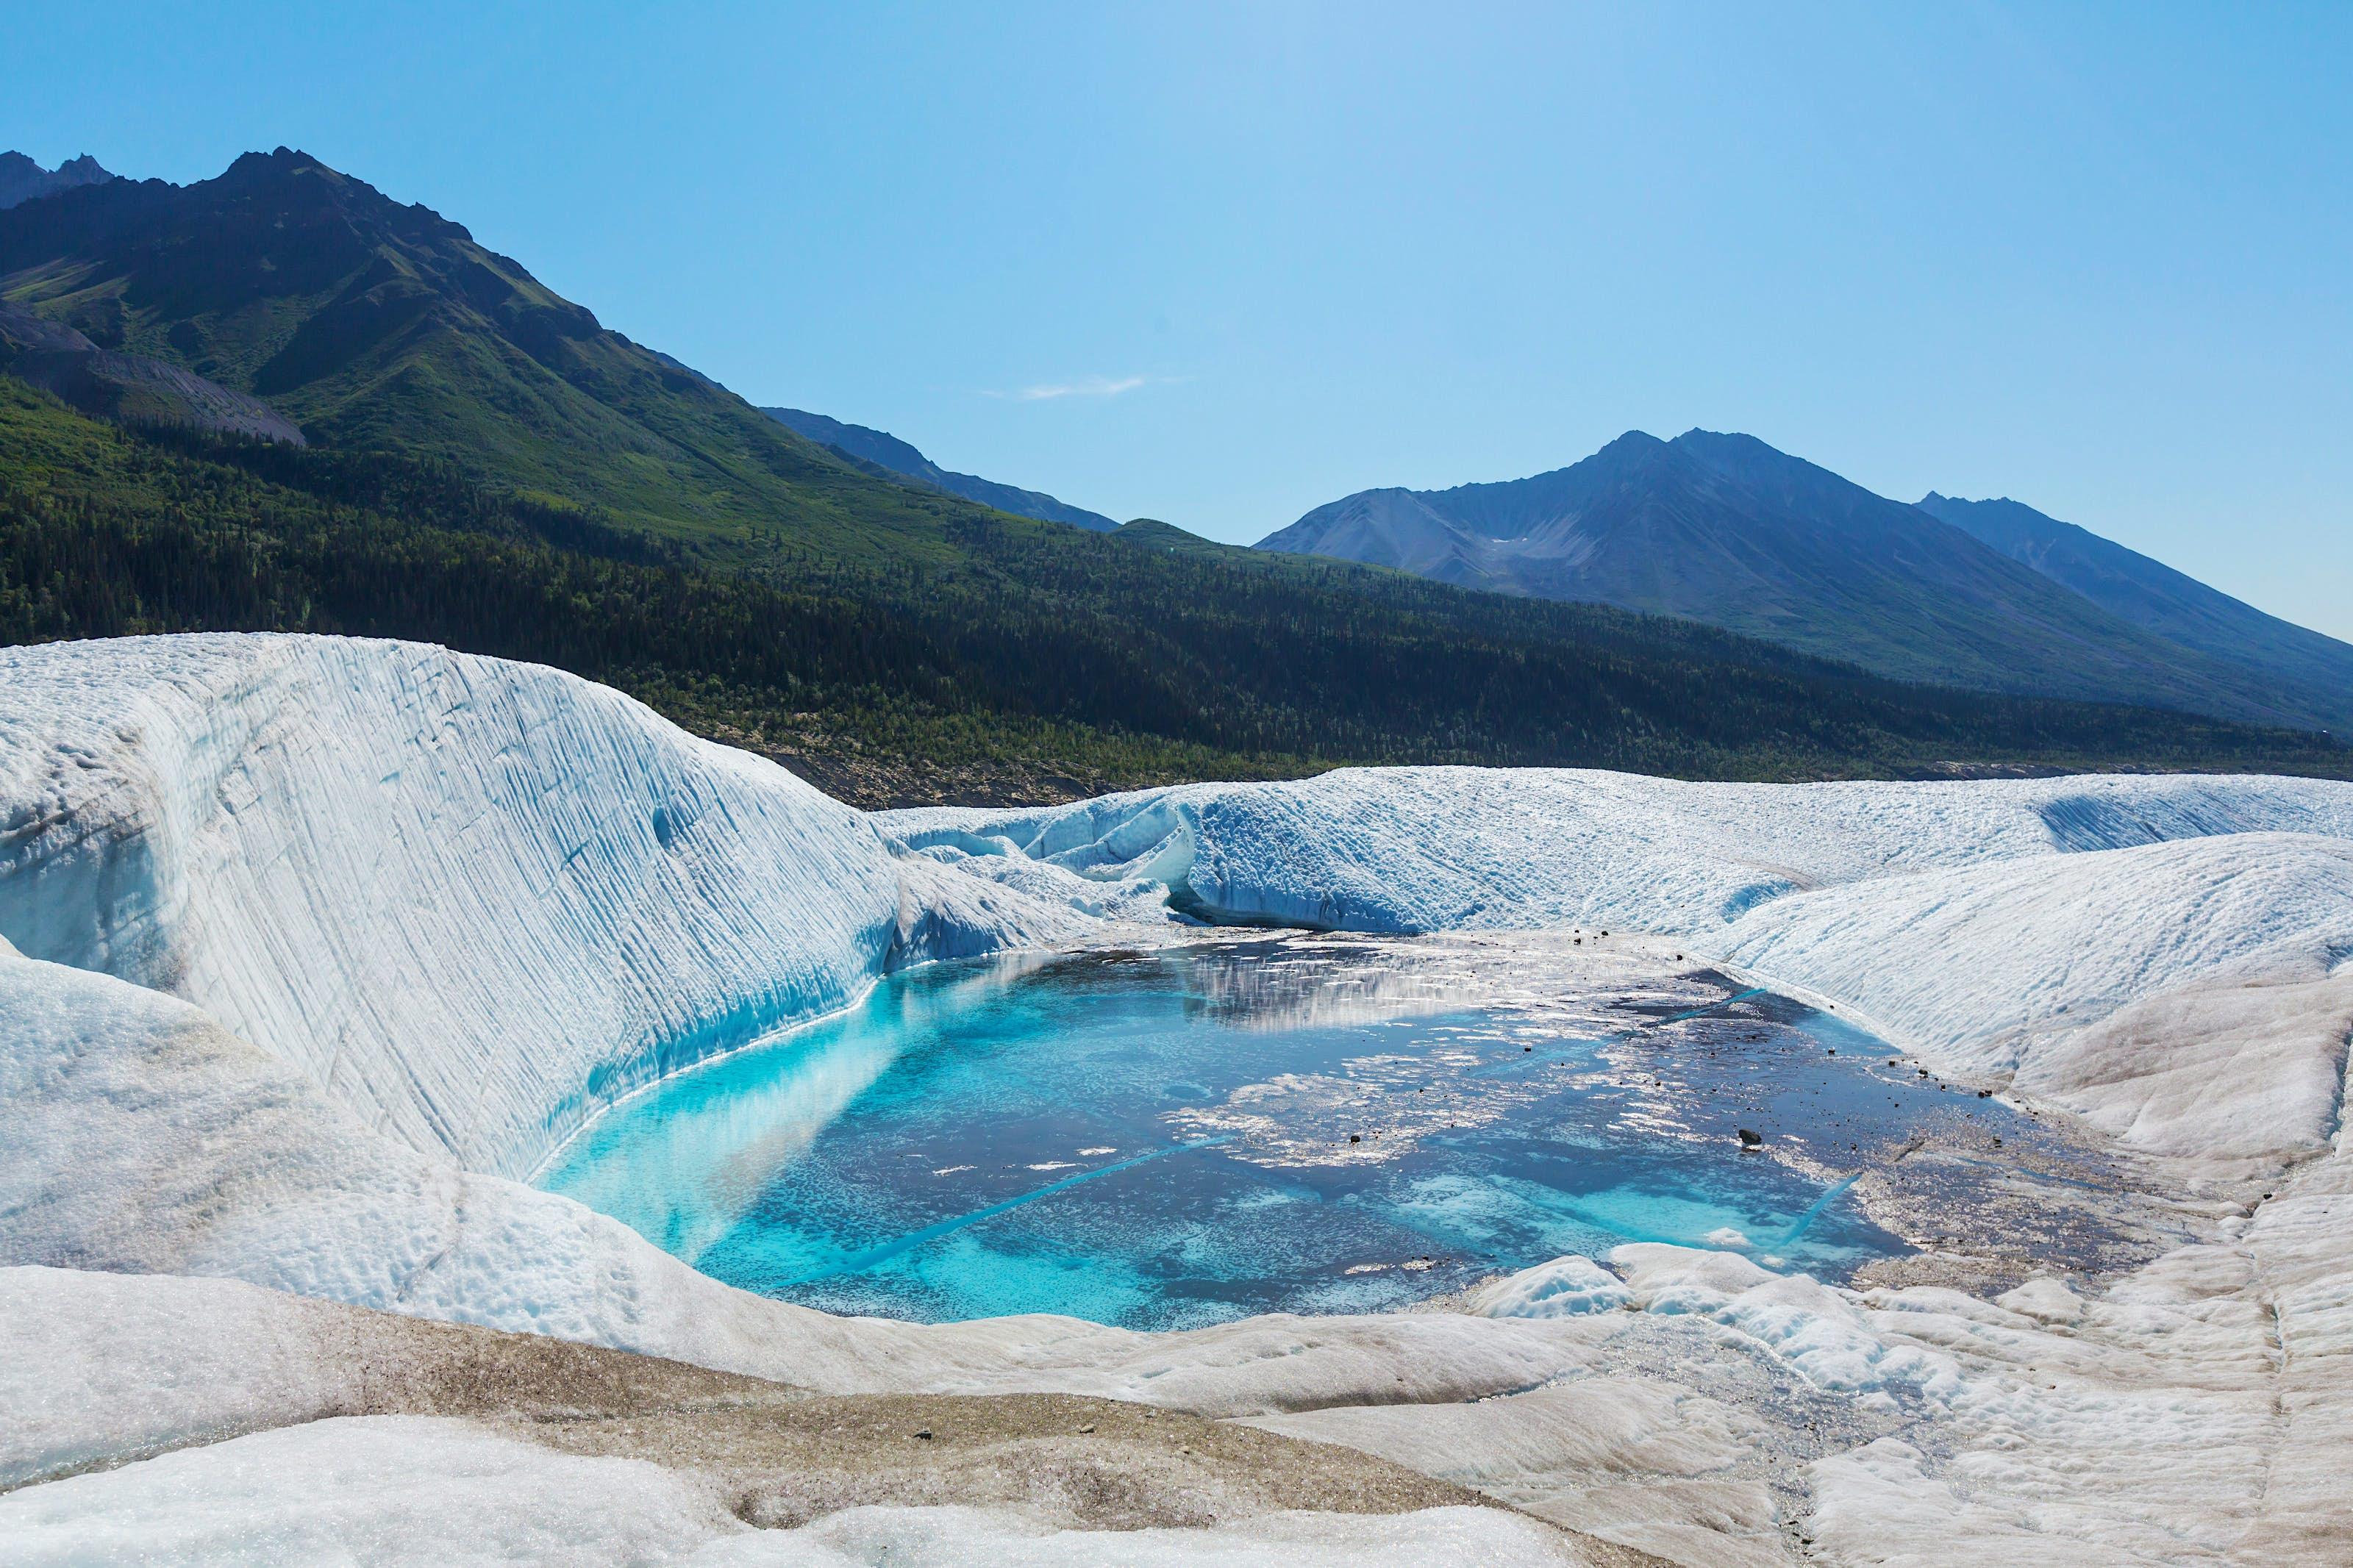 Vivid blue lake contrasting against the glacial ice of Alaska's Wrangell-St. Elias National Park